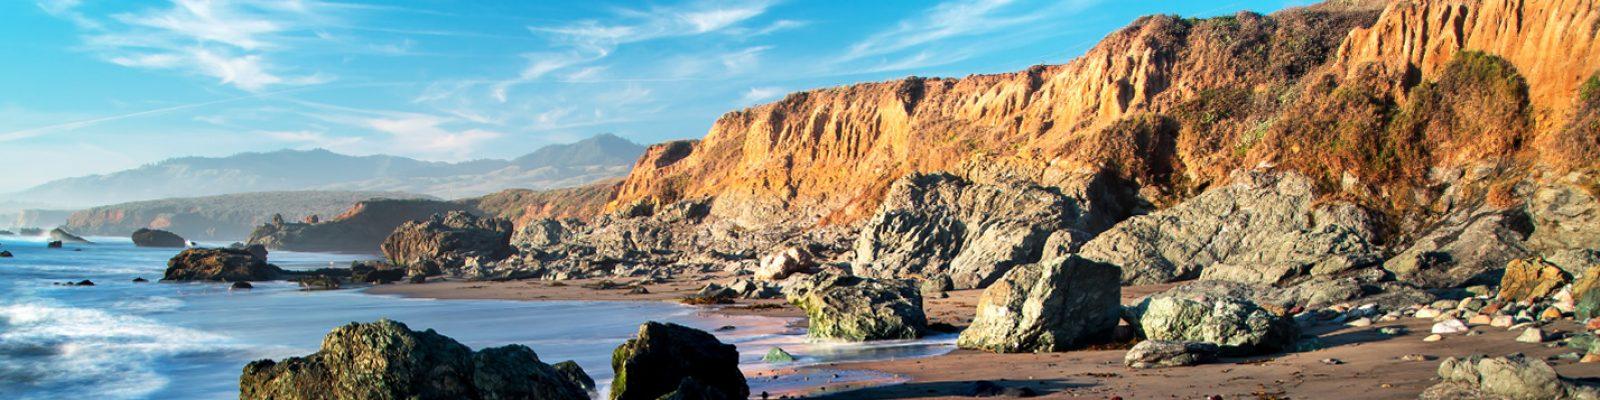 cropped-californiacourtreportersbg.jpg